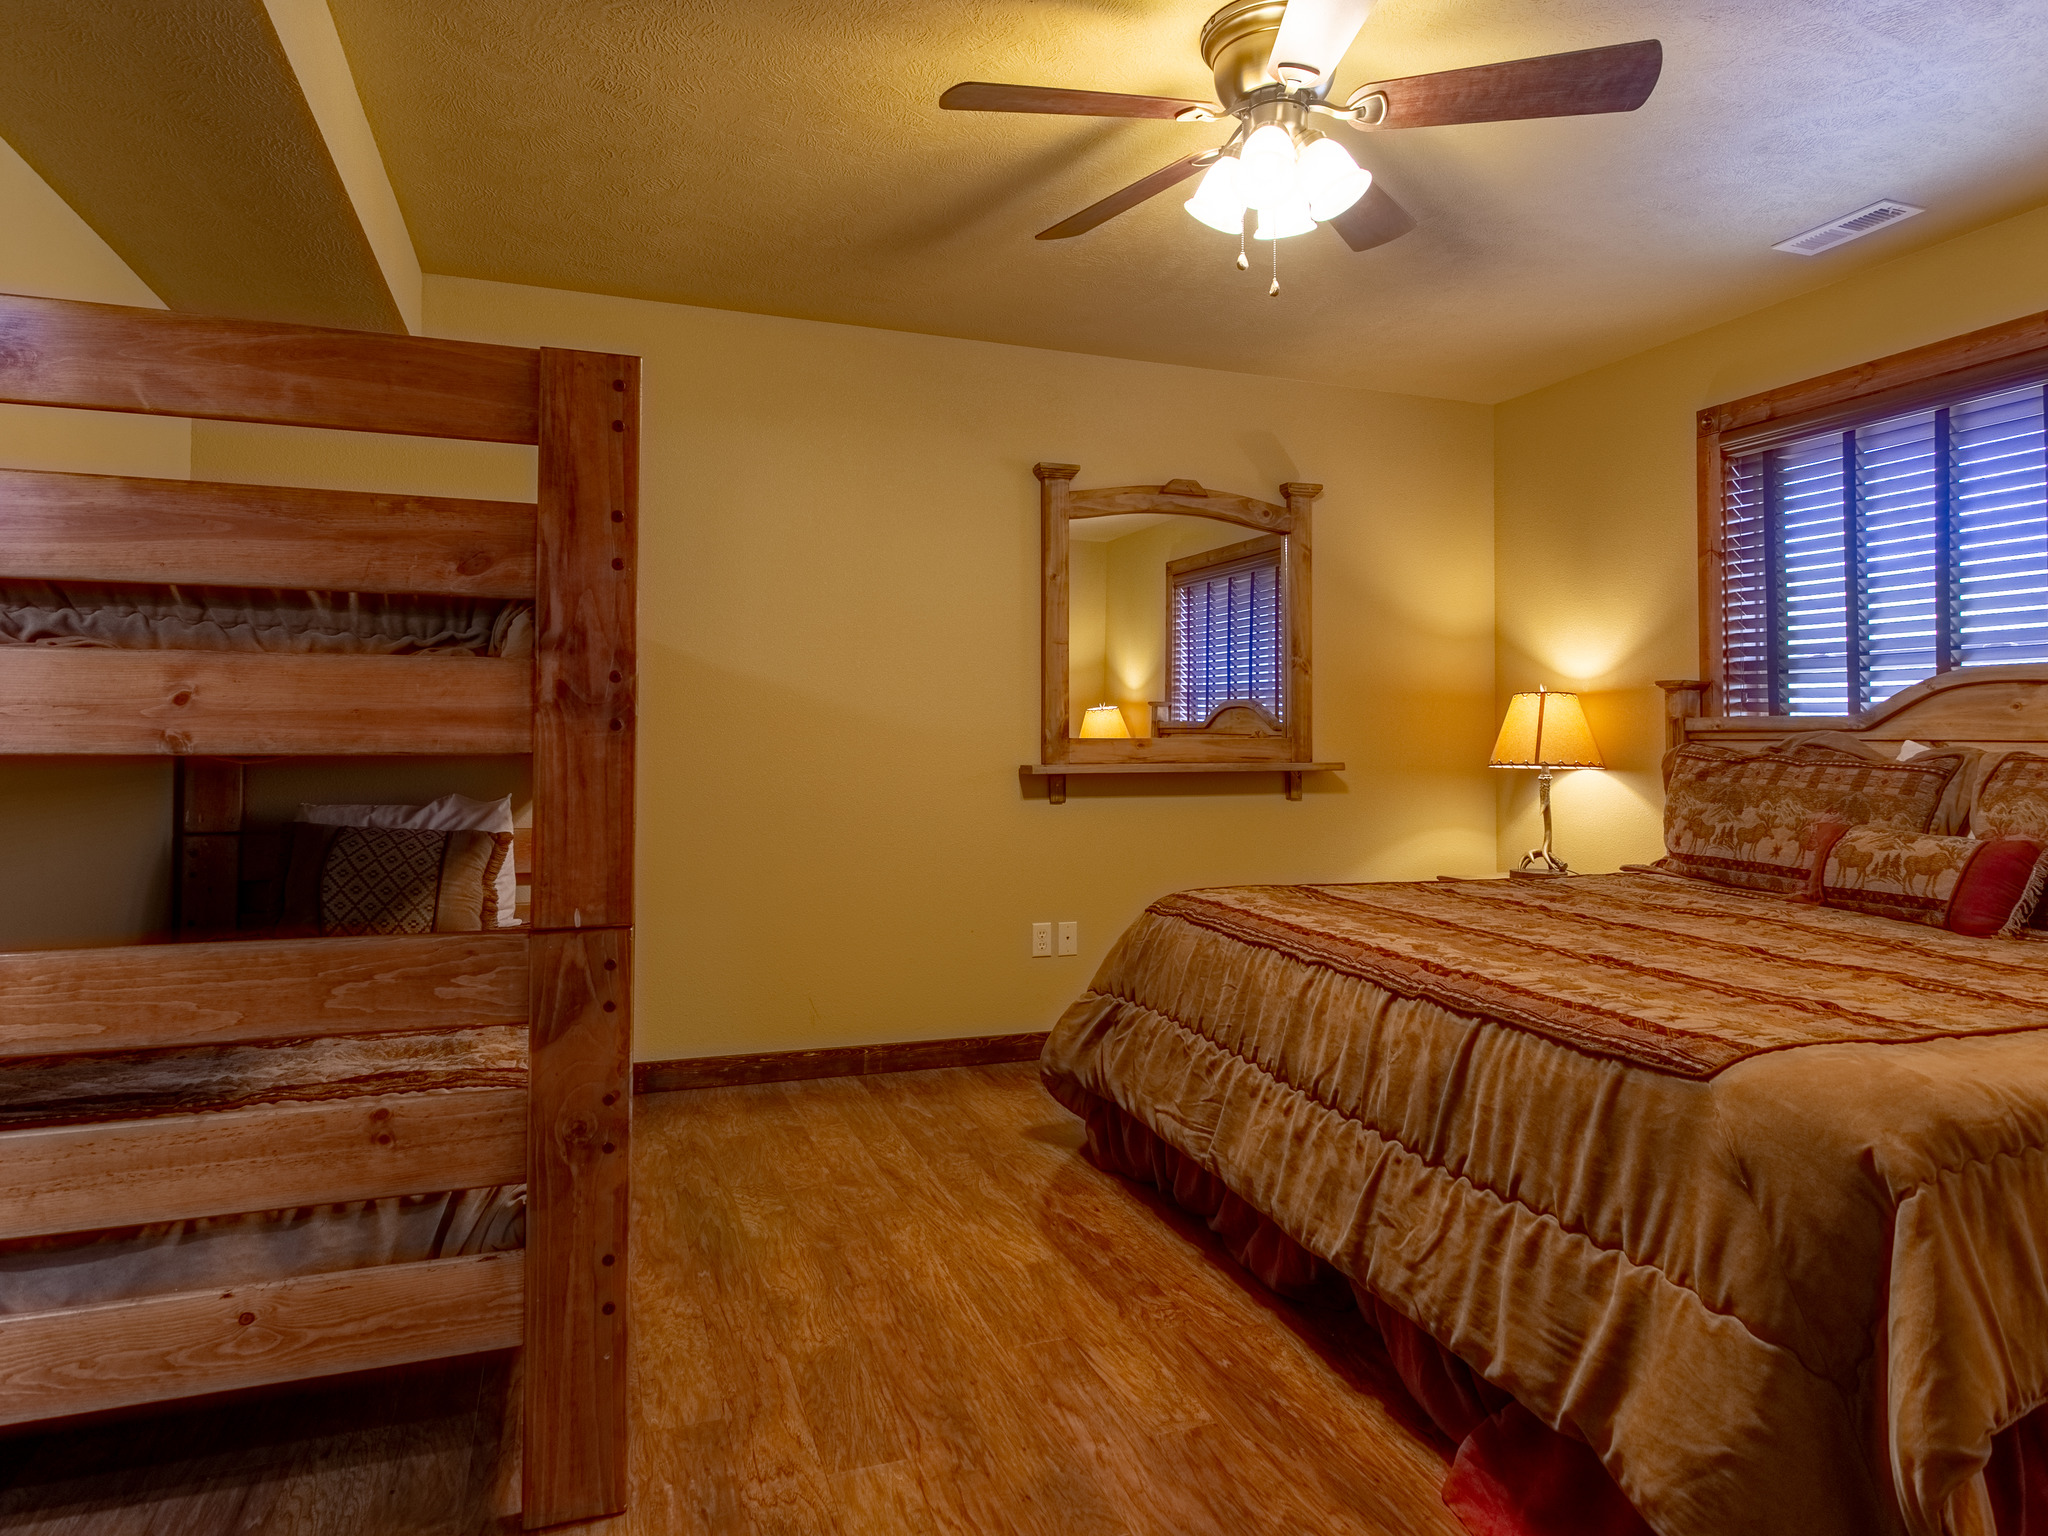 Makin Memories Lodge Branson West Mo Vacation Rentals